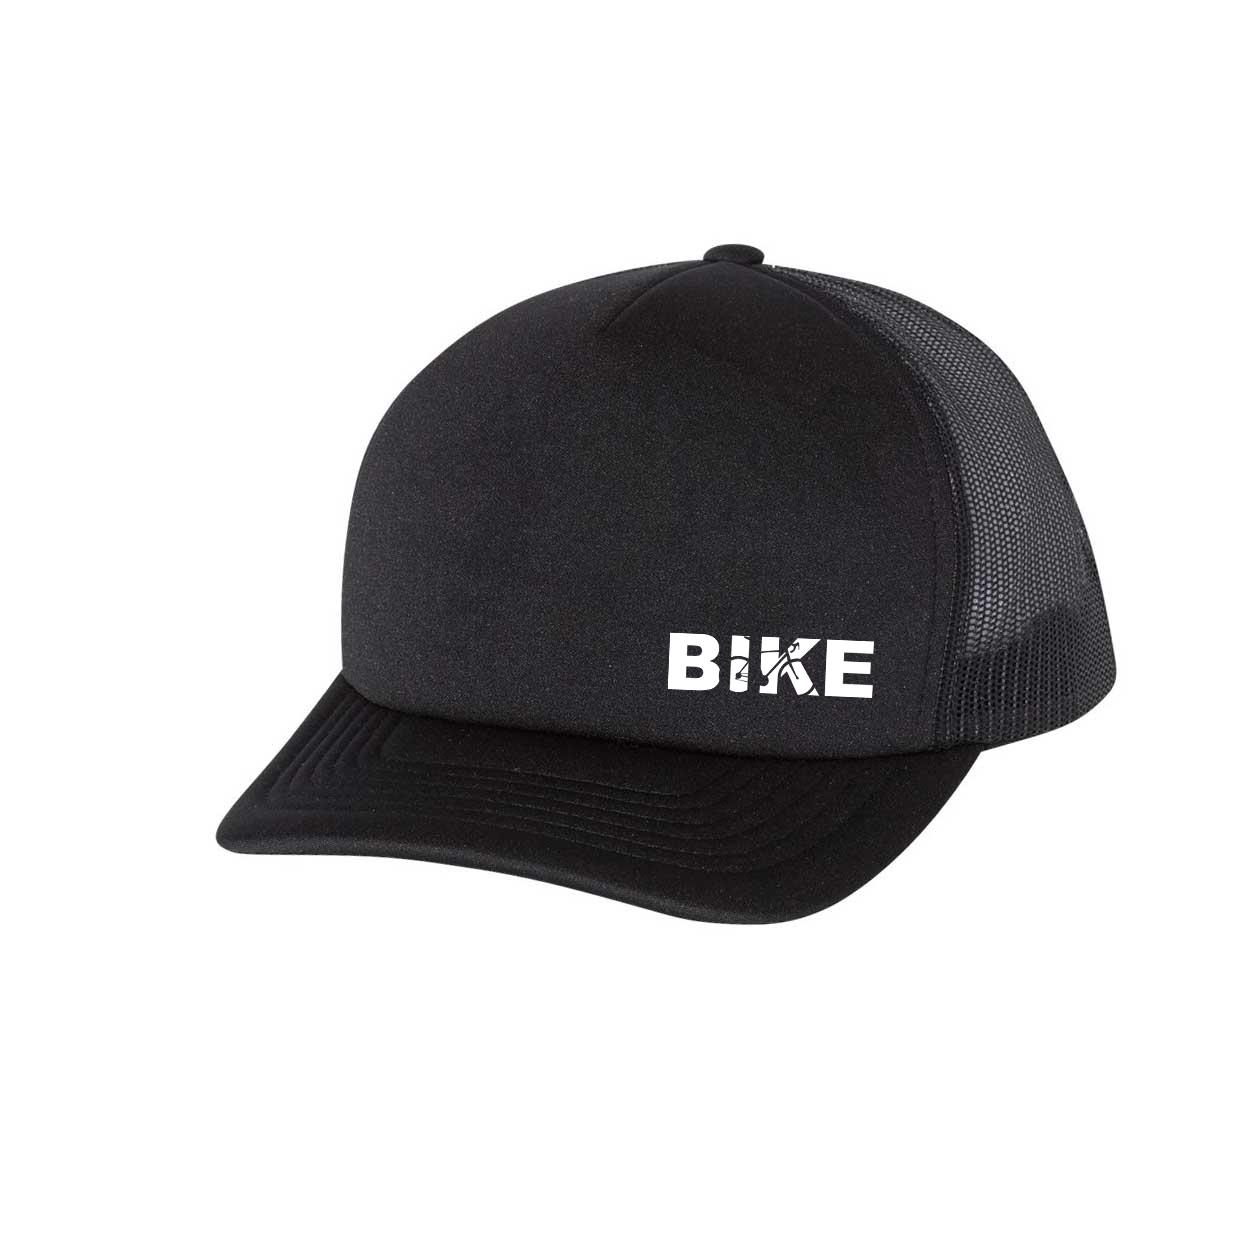 Bike Cycling Logo Night Out Premium Foam Trucker Snapback Hat Black (White Logo)